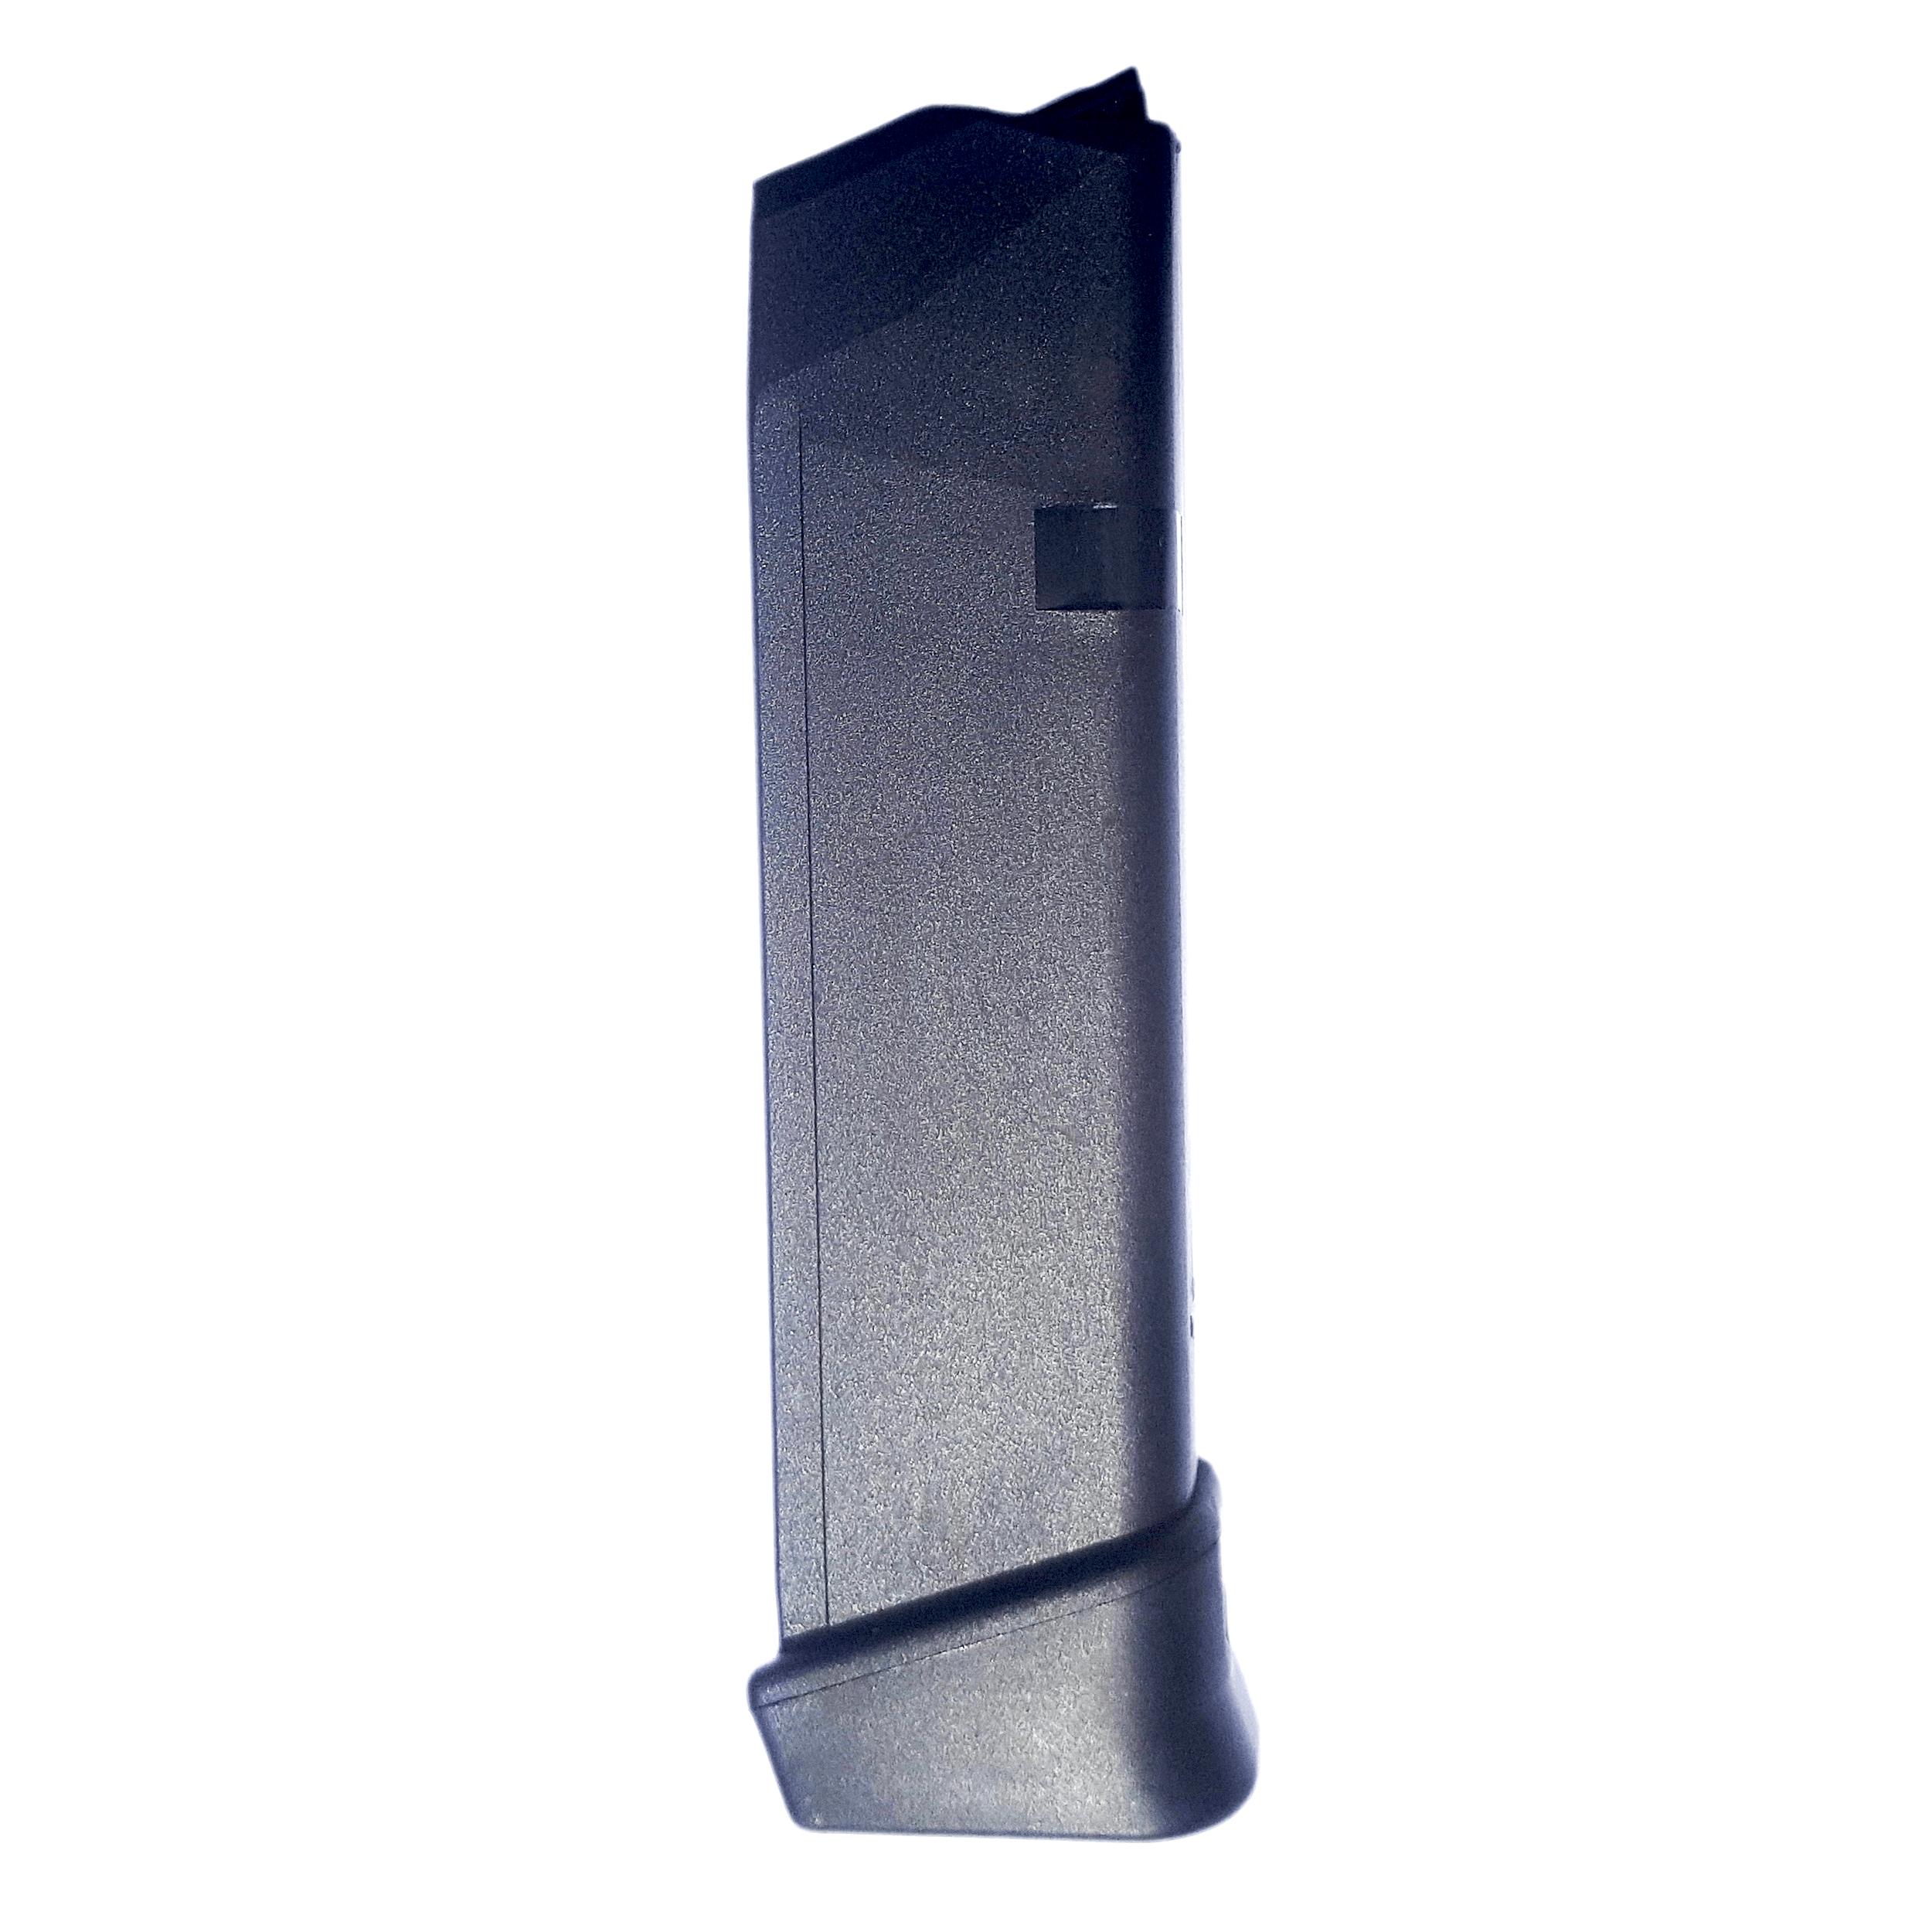 Glock Magazine 9mm 17+2 rounds